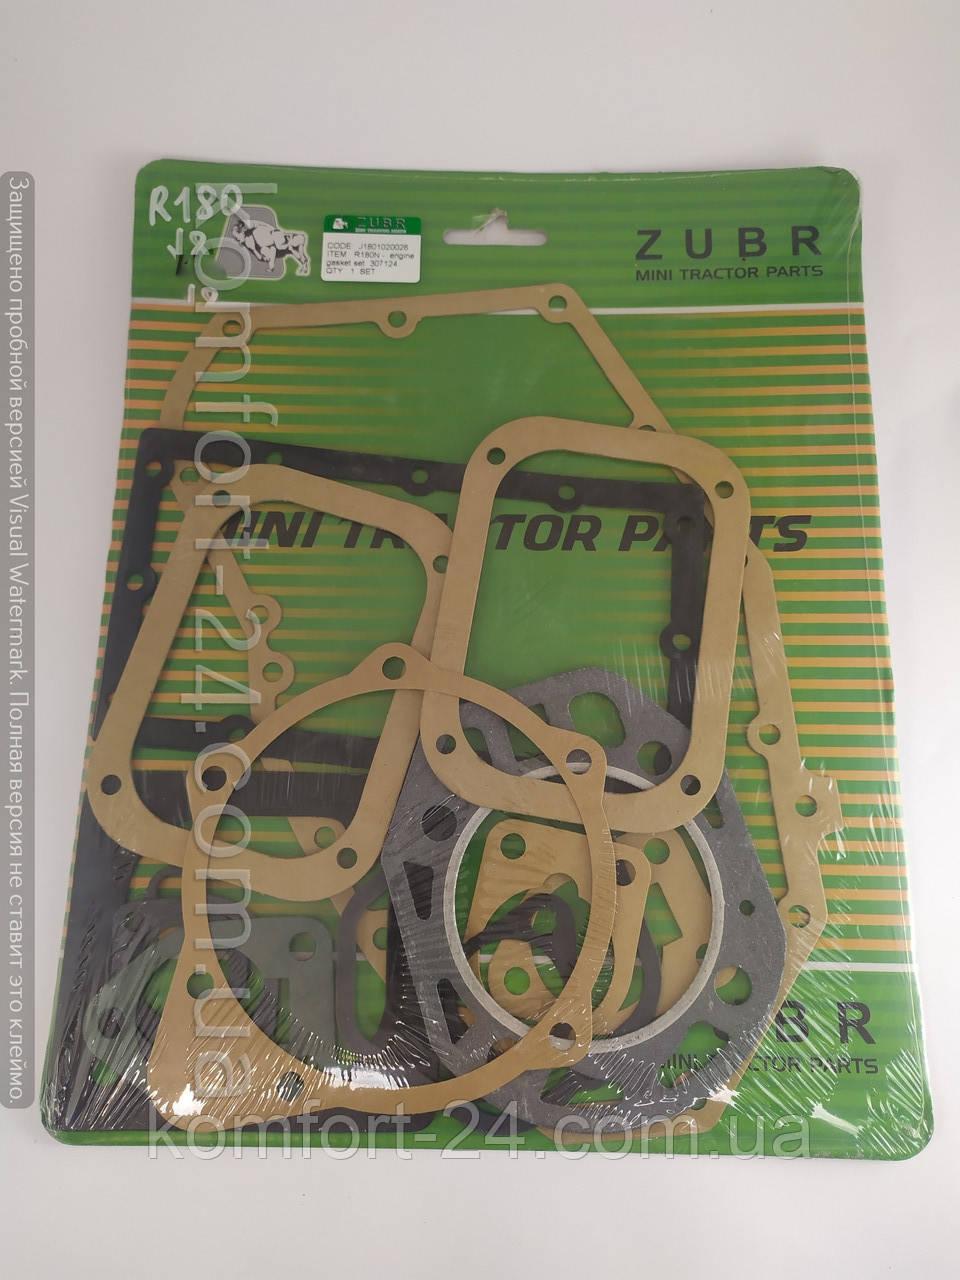 Прокладки двигуна до мотоблоку R180(Zubr)